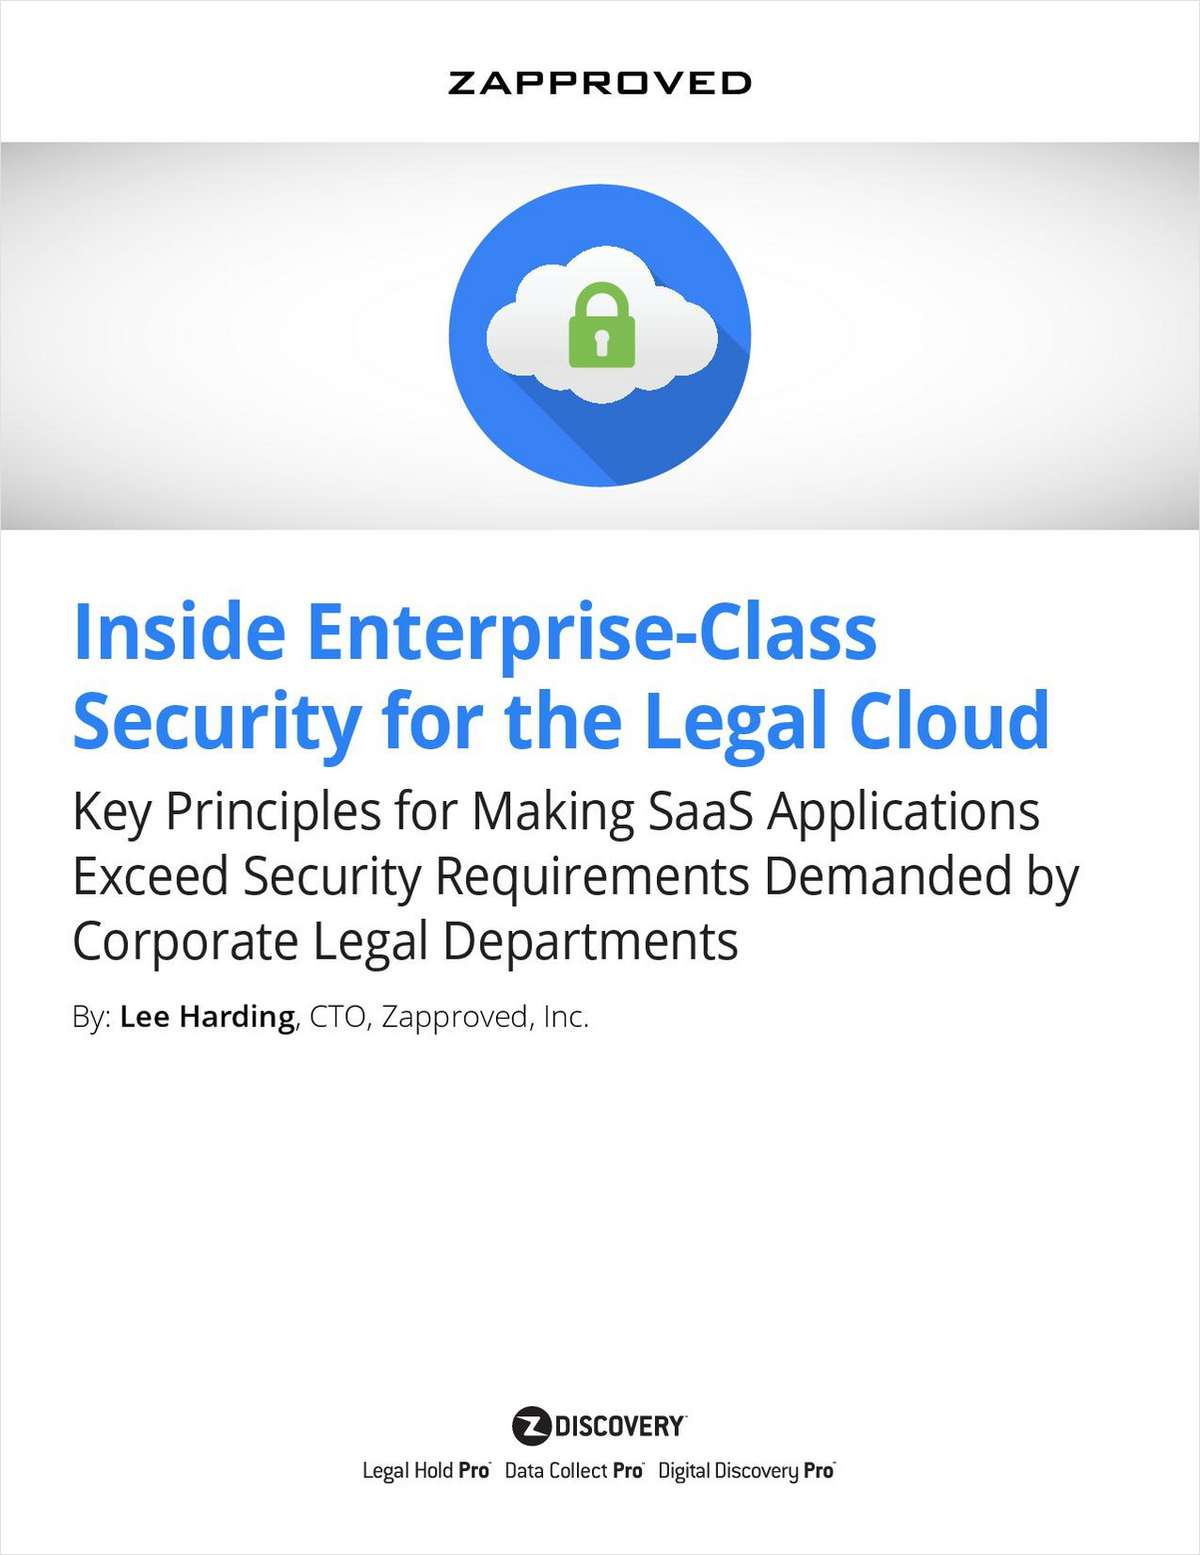 Inside Enterprise-Class Security for the Legal Cloud